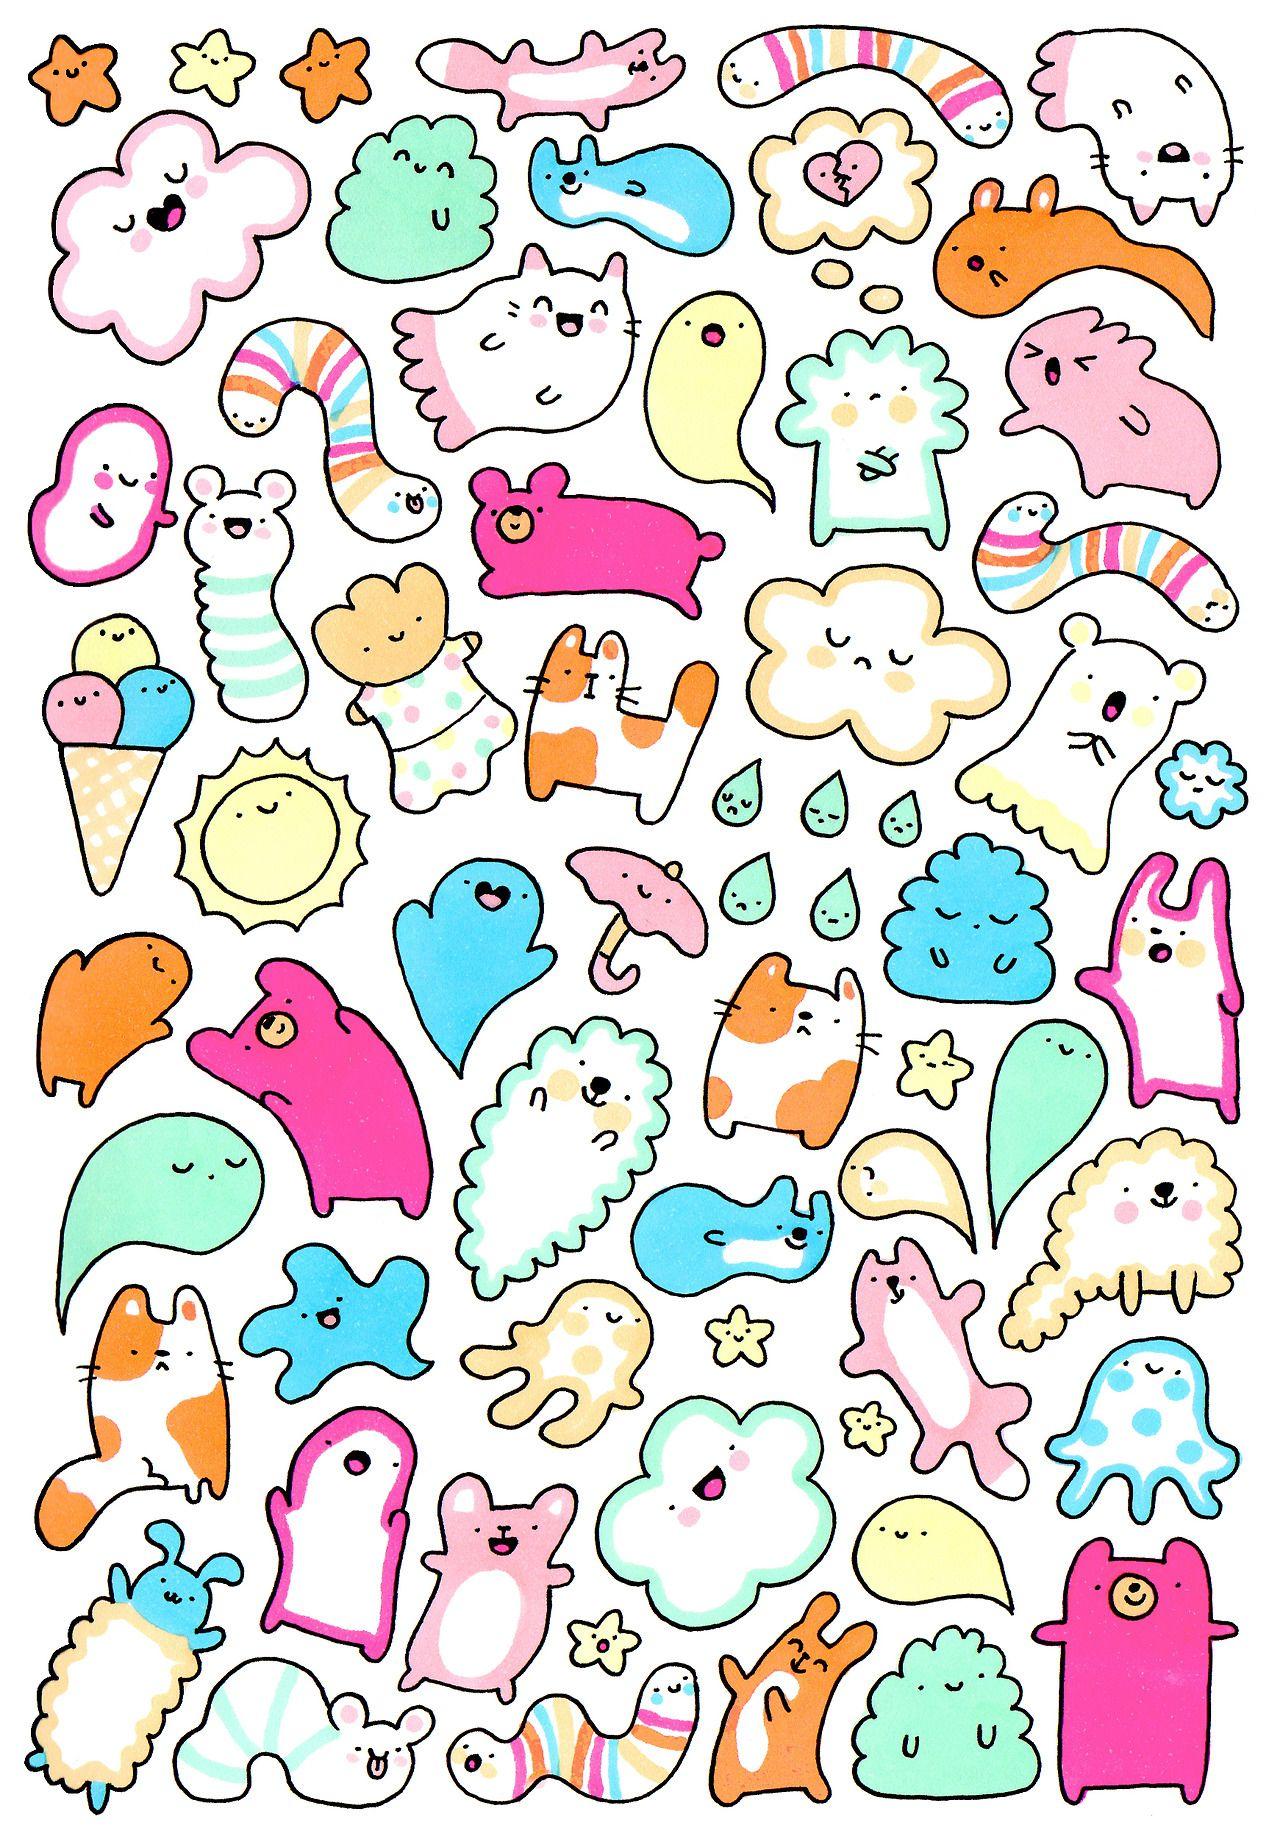 Cute Doodle Illustrations